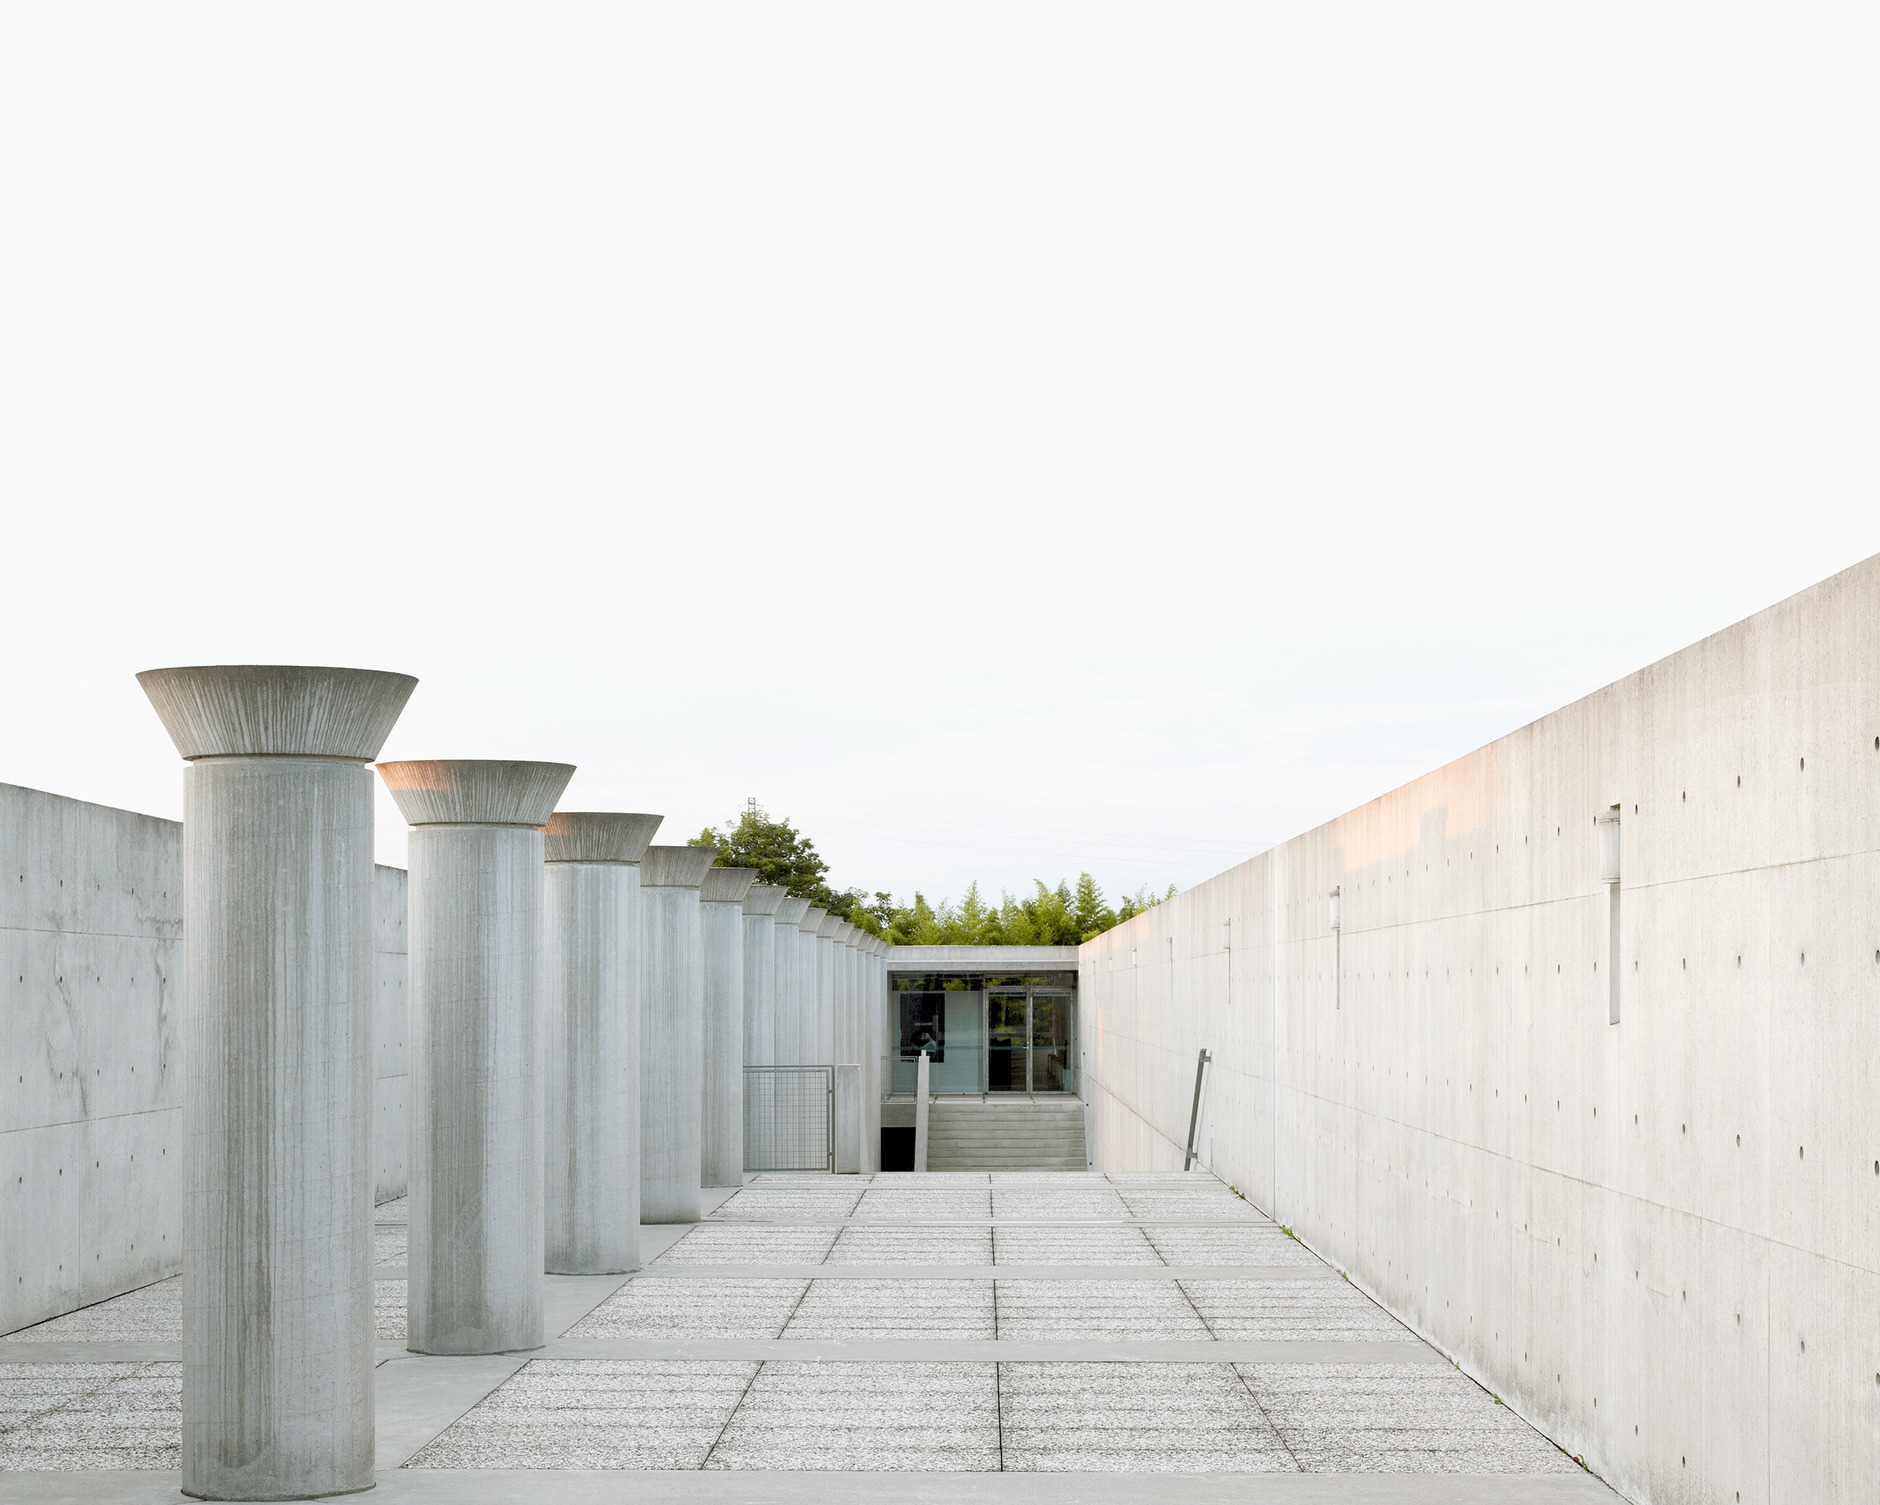 Архитектор Тадао Андо: певец бетона (галерея 15, фото 3)